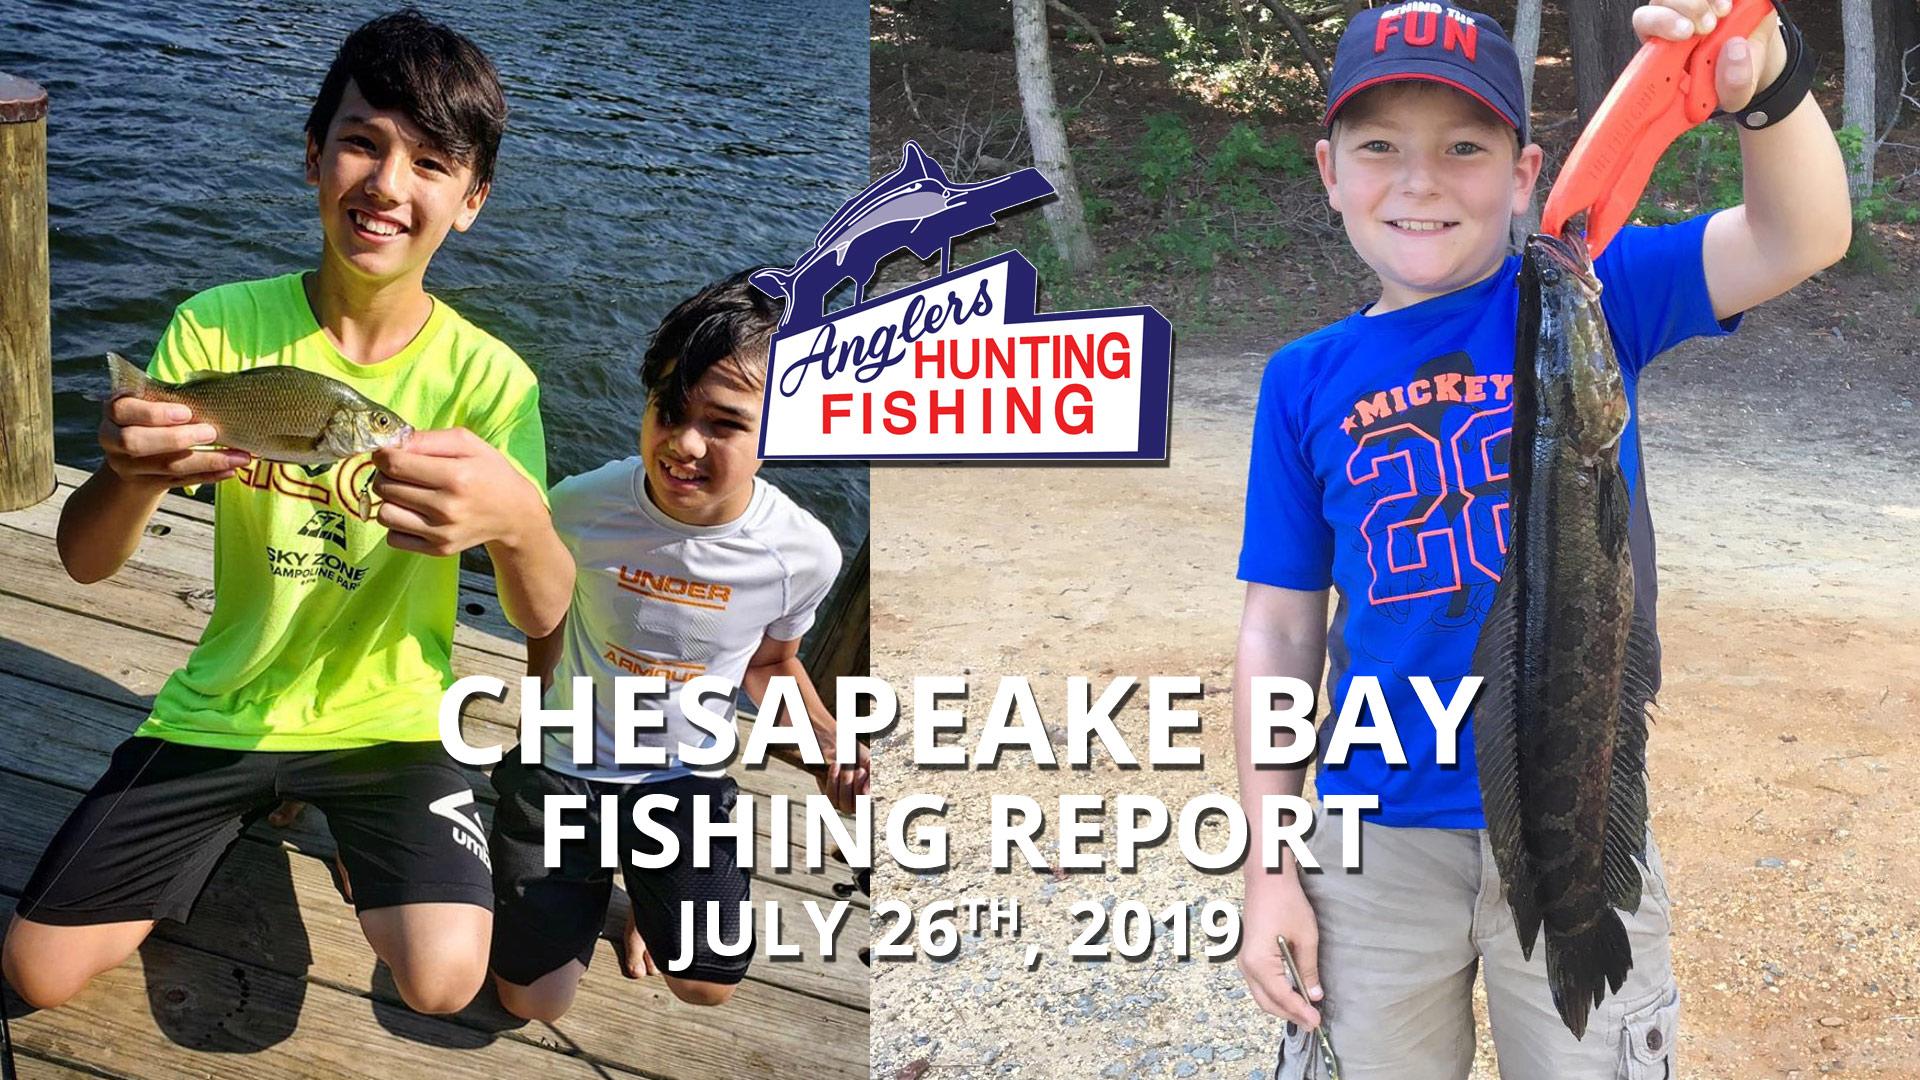 Chesapeake Bay Fishing Report - July 26th, 2019